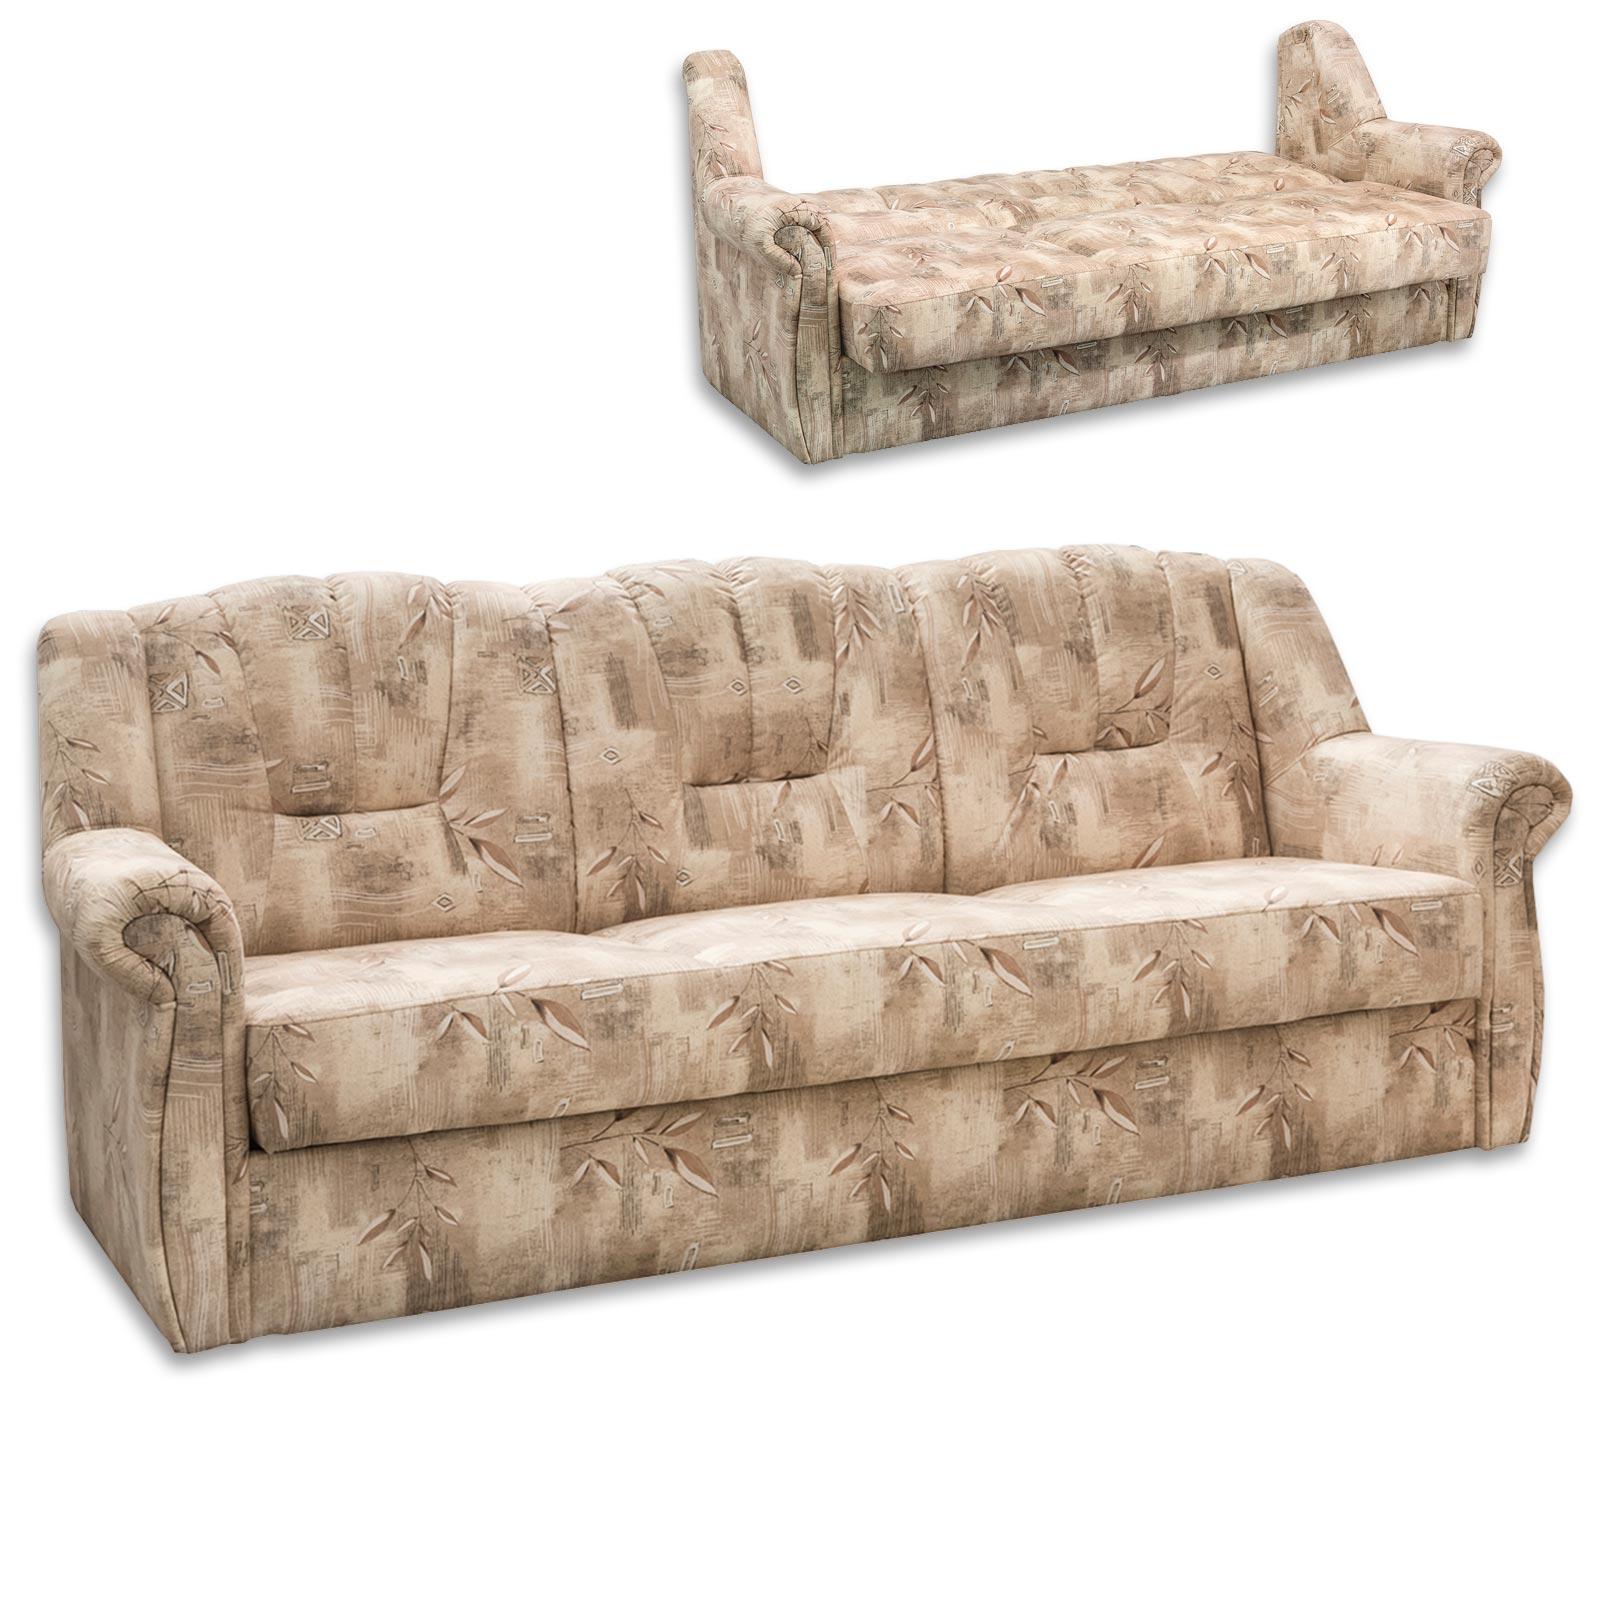 Full Size of 3 Sitzer Sofa Roller Poco Mit Schlaffunktion Leder Ikea Bettfunktion Federkern Und 2 Sessel Ocker Microfaser Liegefunktion Online Bei Lila Kare Blaues U Form Sofa 3 Sitzer Sofa